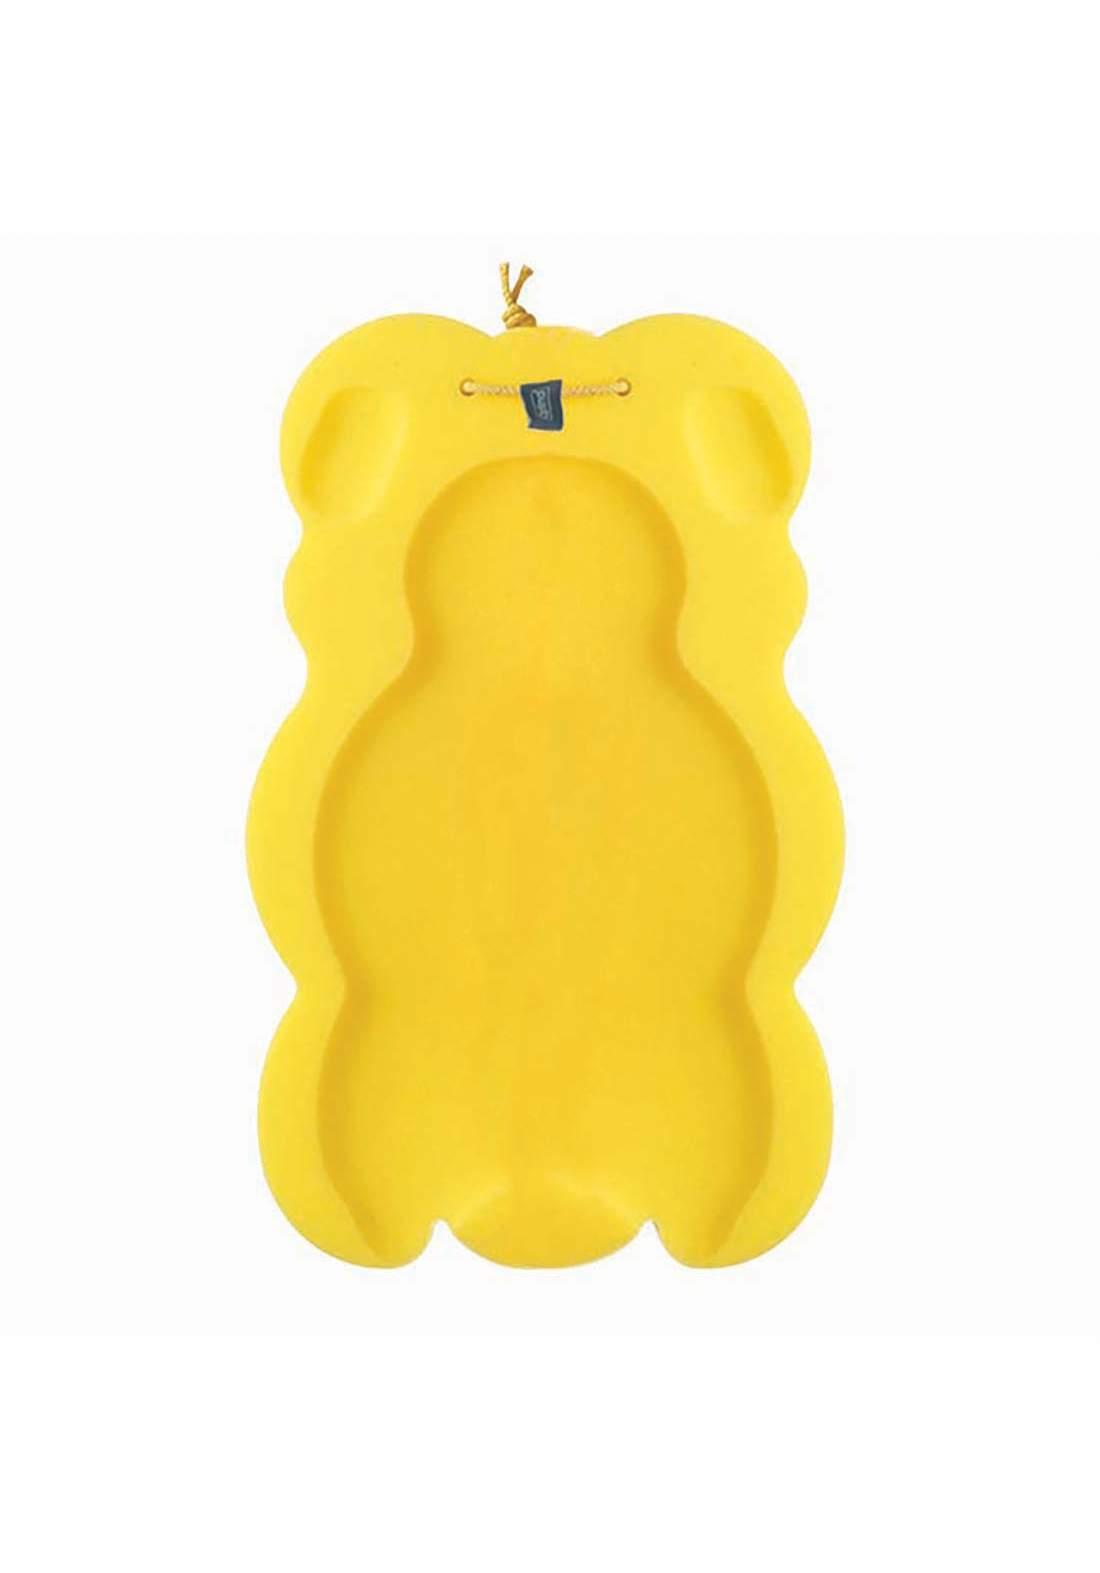 Optimal Soft bath sponge (0-6m) yallow وسادة الاستحمام للاطفال